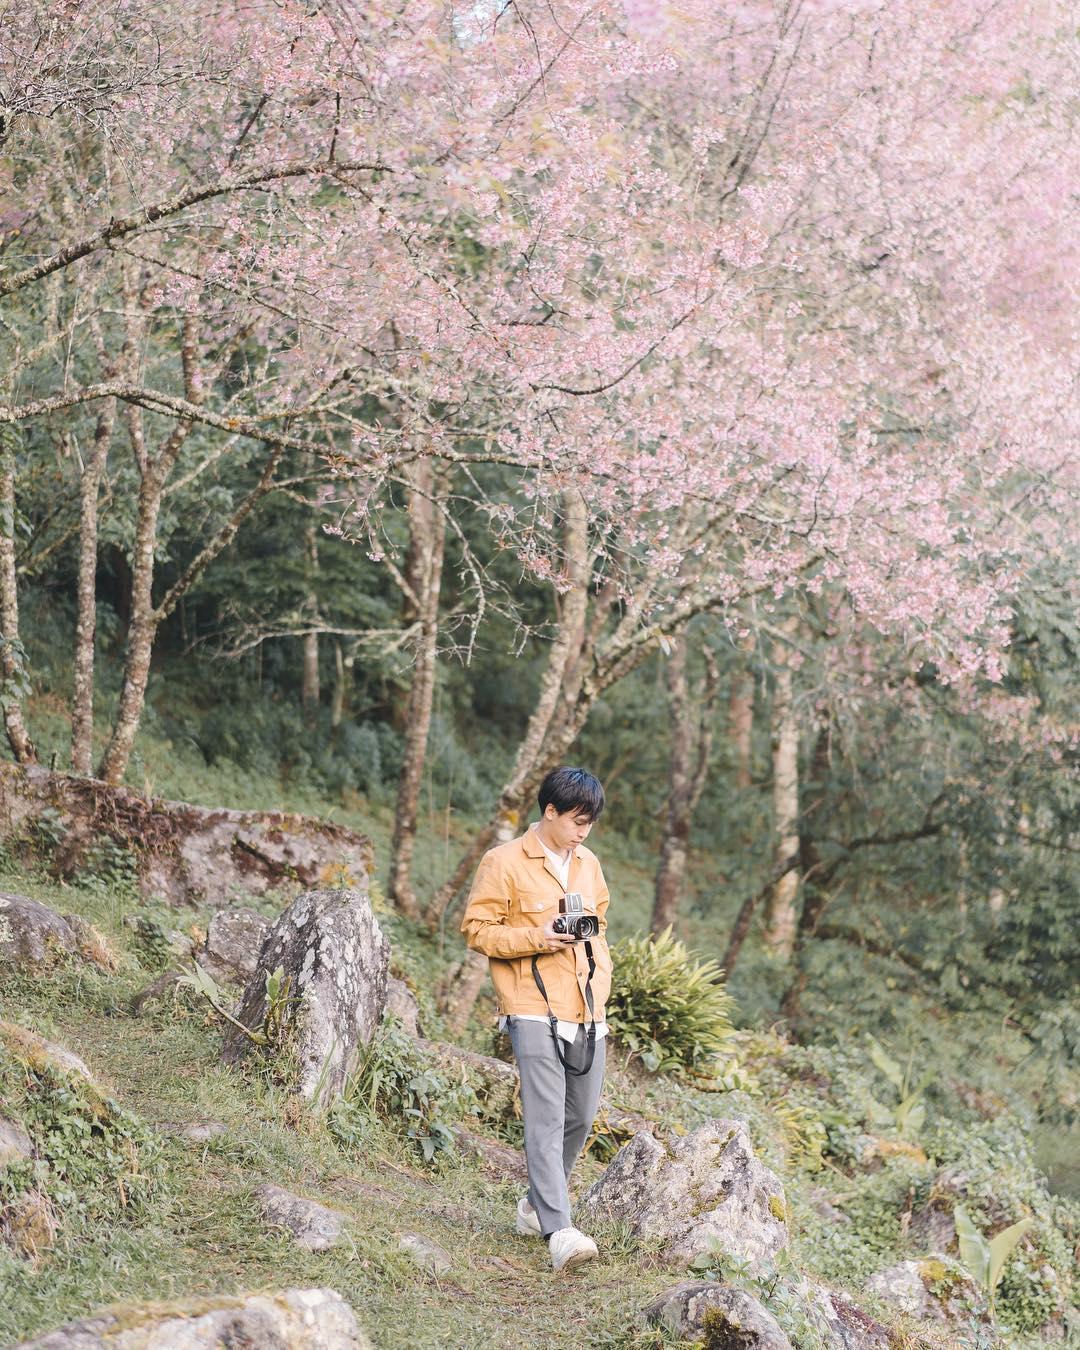 Cherry blossoms on Doi Inthanon